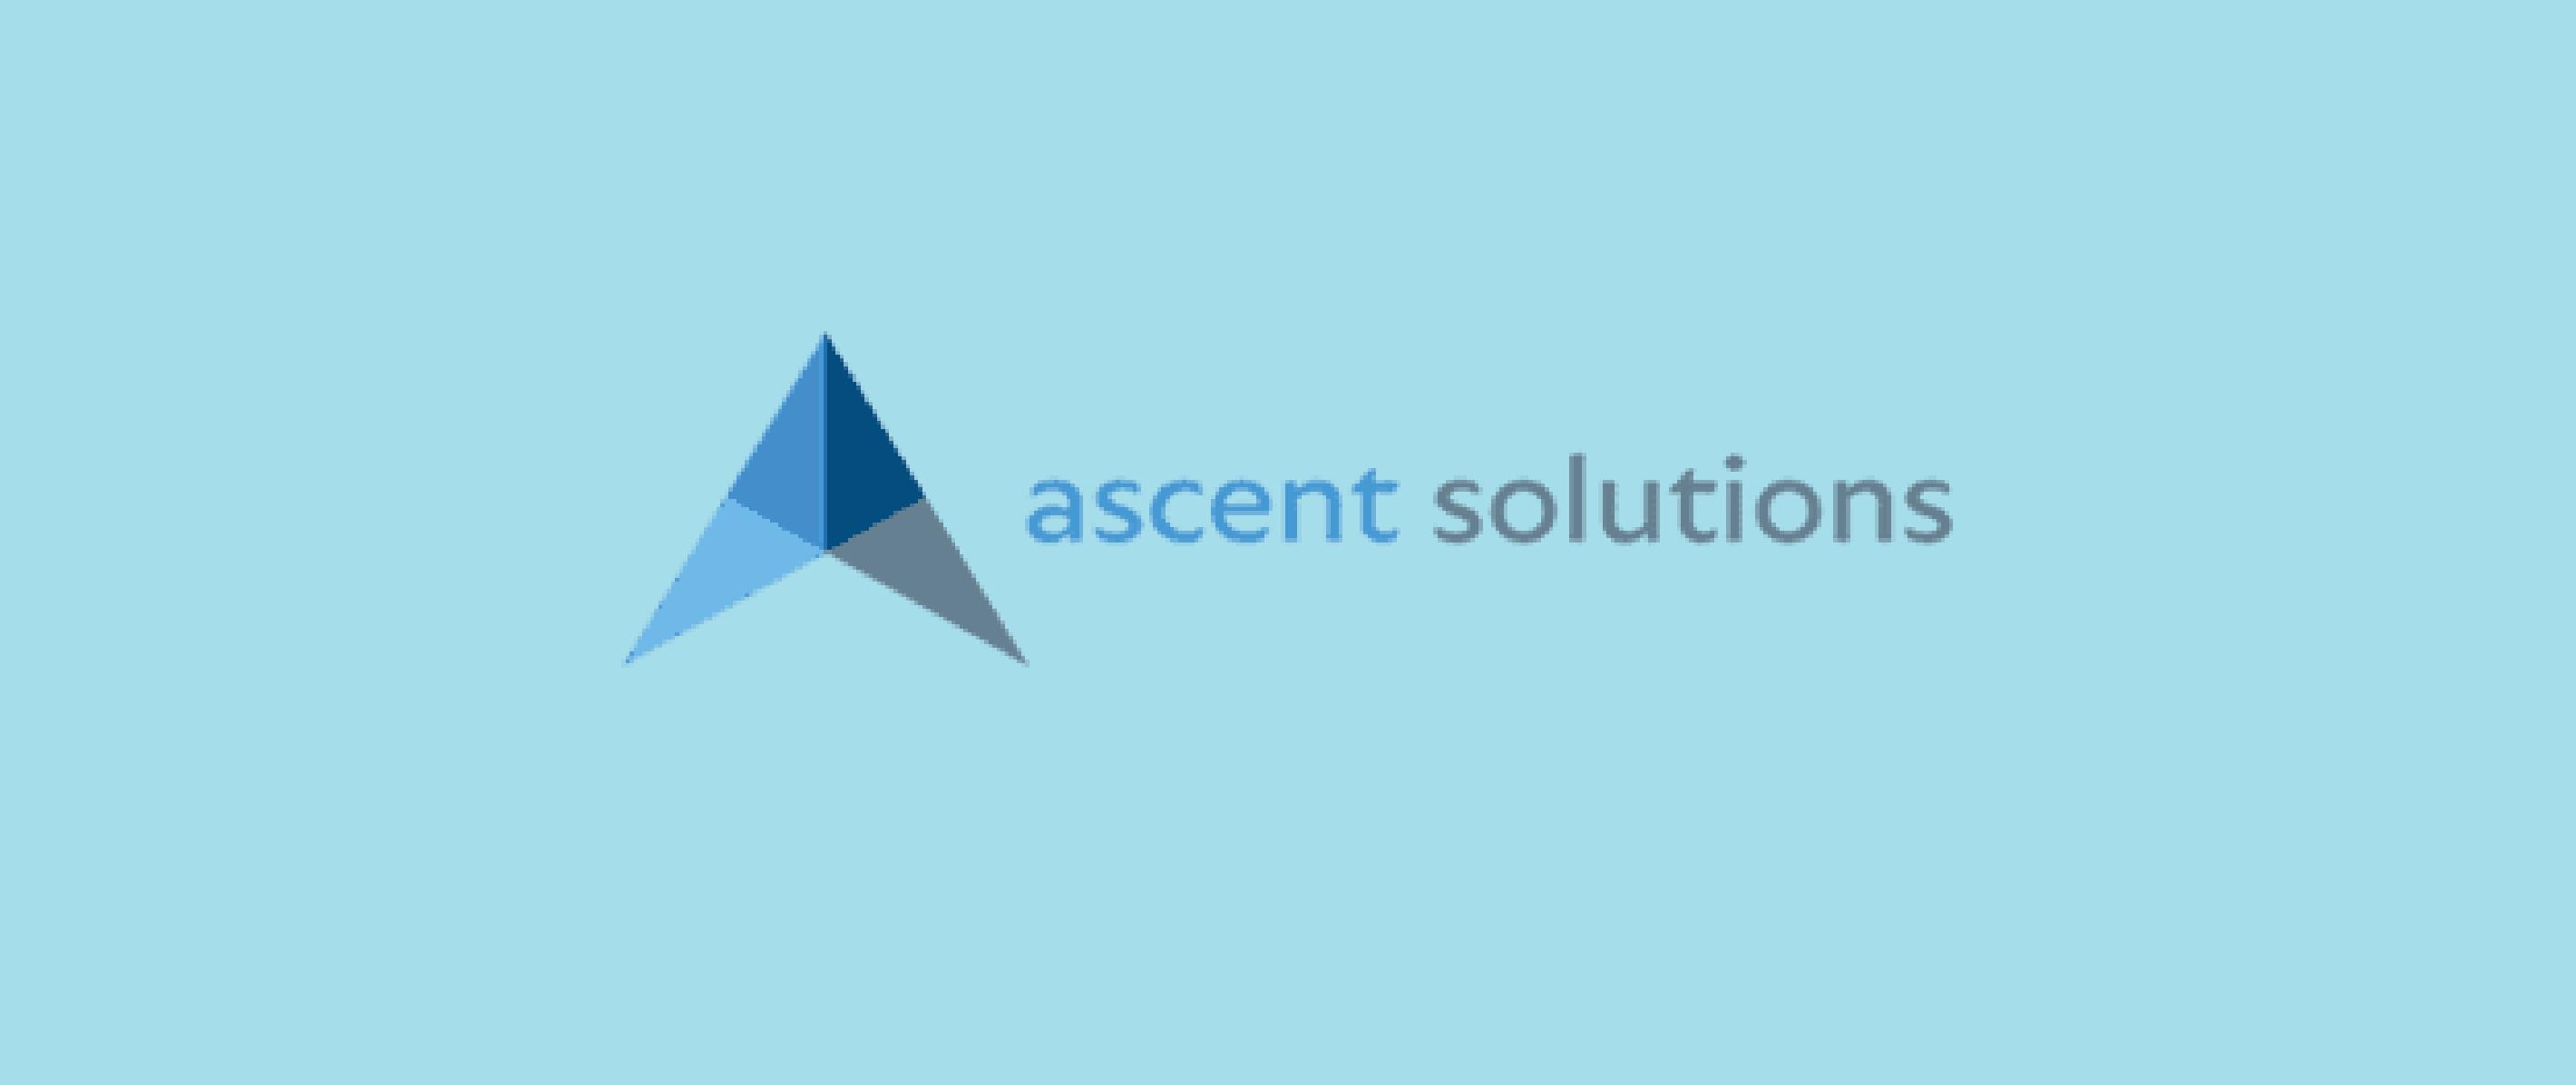 Ascent Solutions